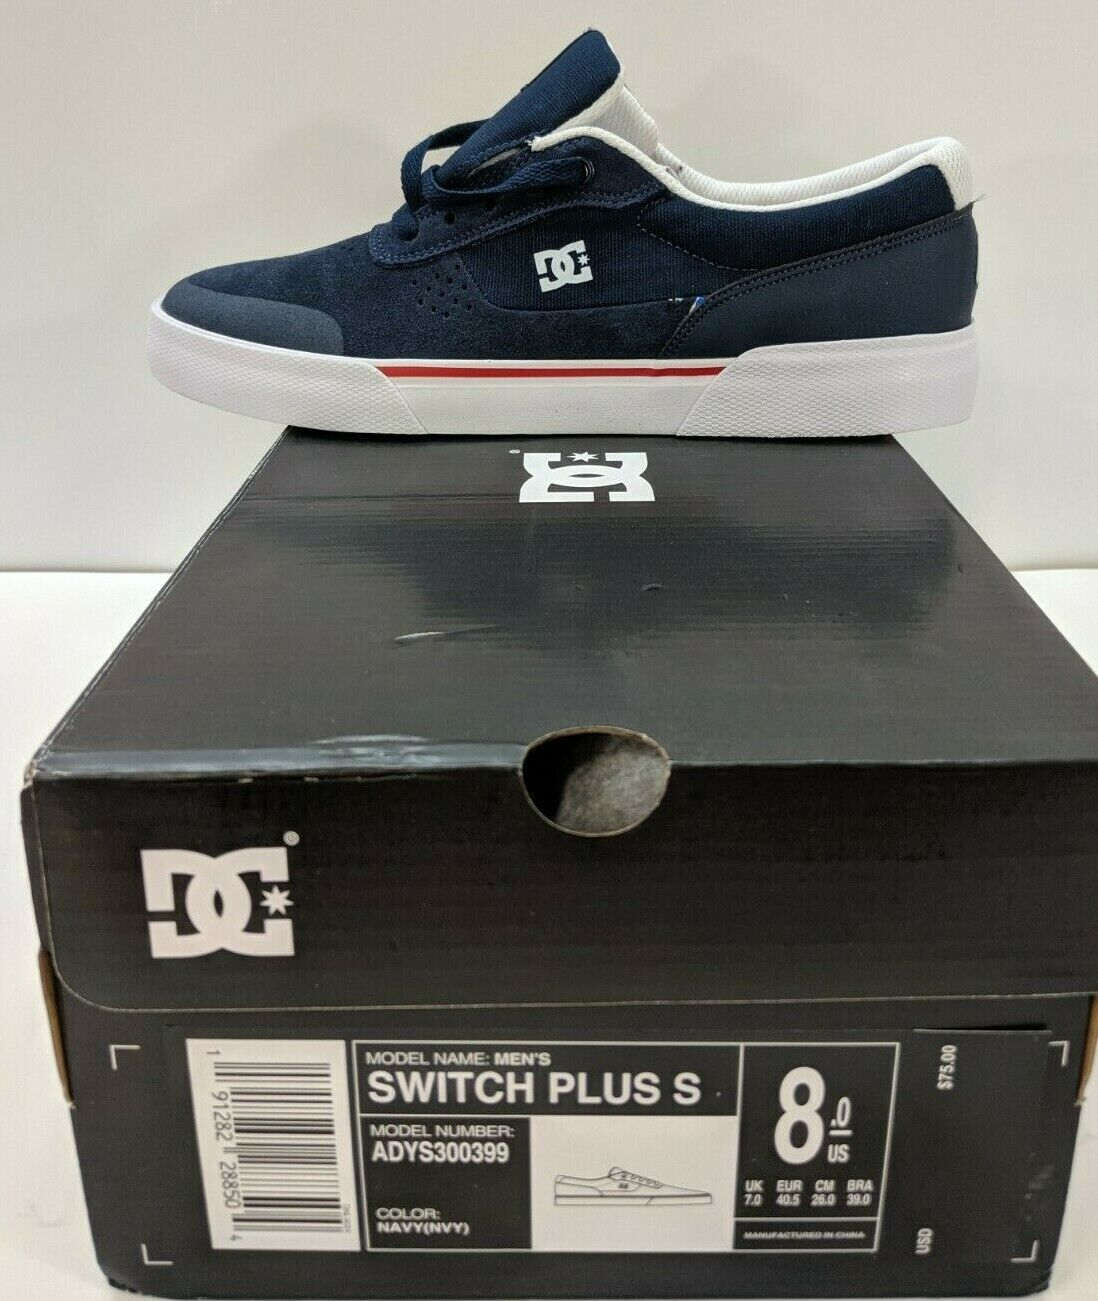 Skate Shoes Adys300399 DC Shoes Mens Shoes Switch Plus S